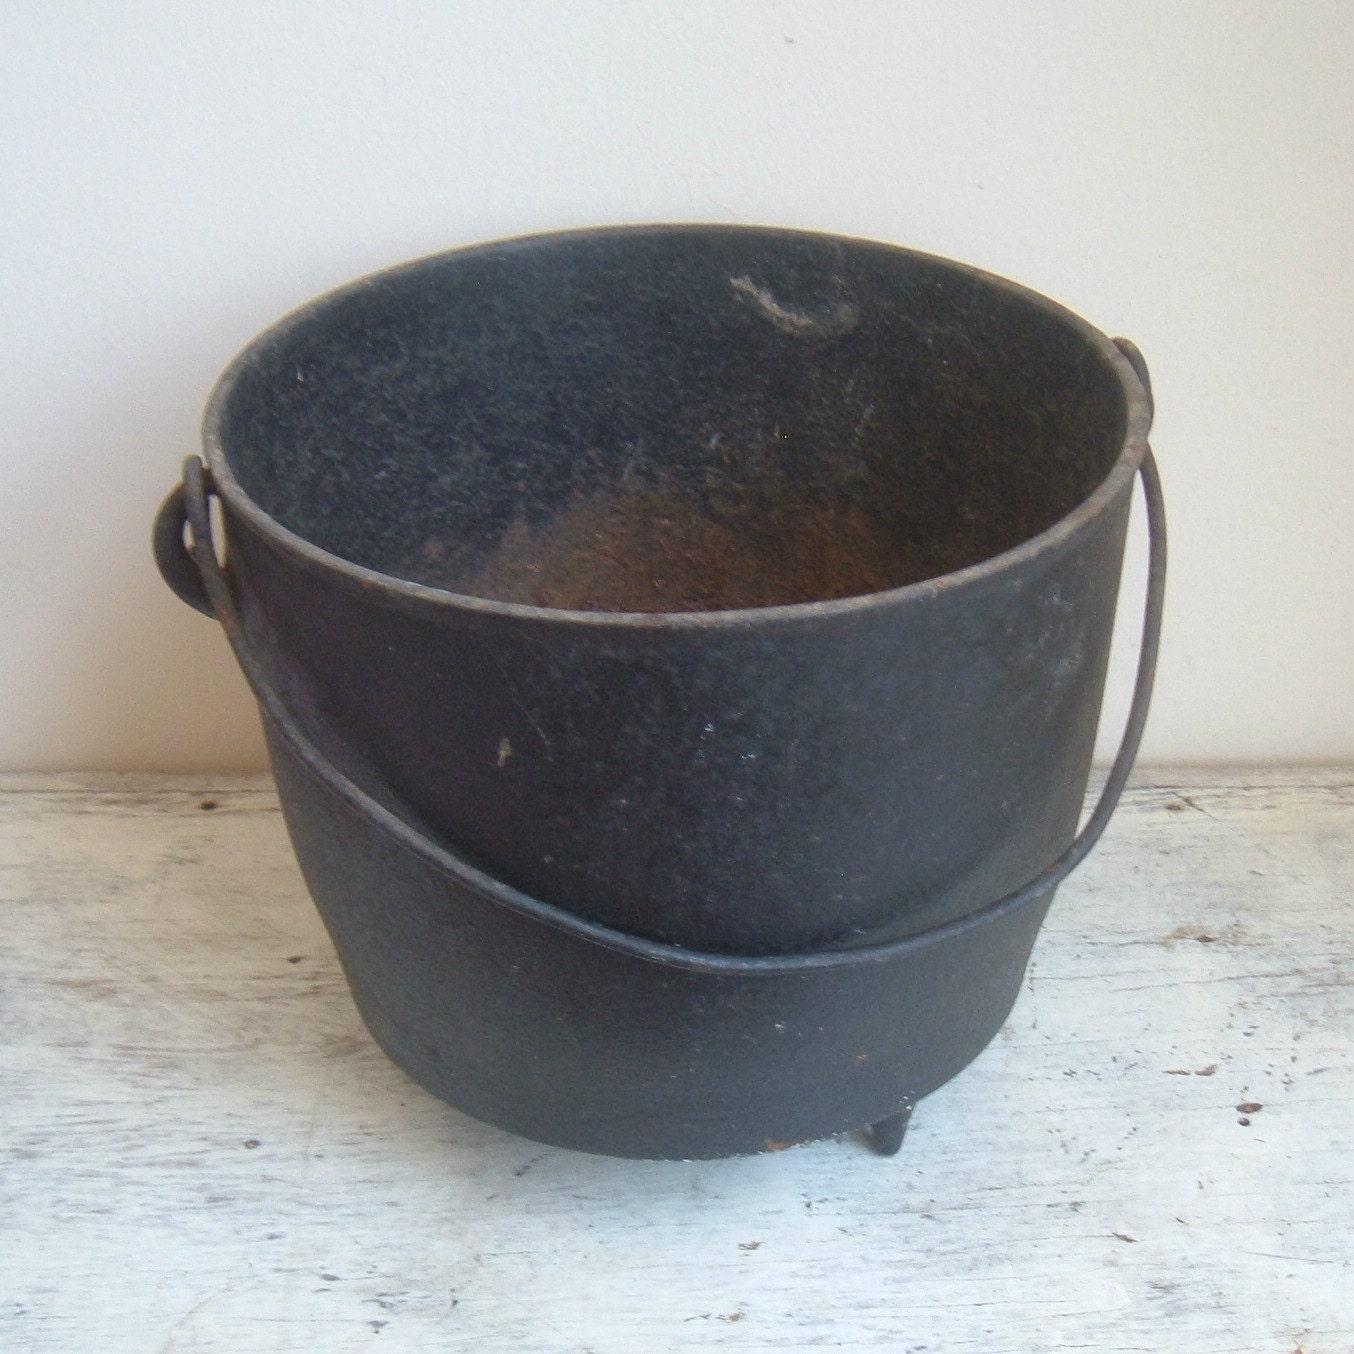 Antique Cast Iron Cauldron. Shades For French Doors. Theater Room Ideas. Shower Seat. Black Floor Vase. Wine Bar Cabinet. Light Blue Backsplash. Bed Scarf. Lake Deck